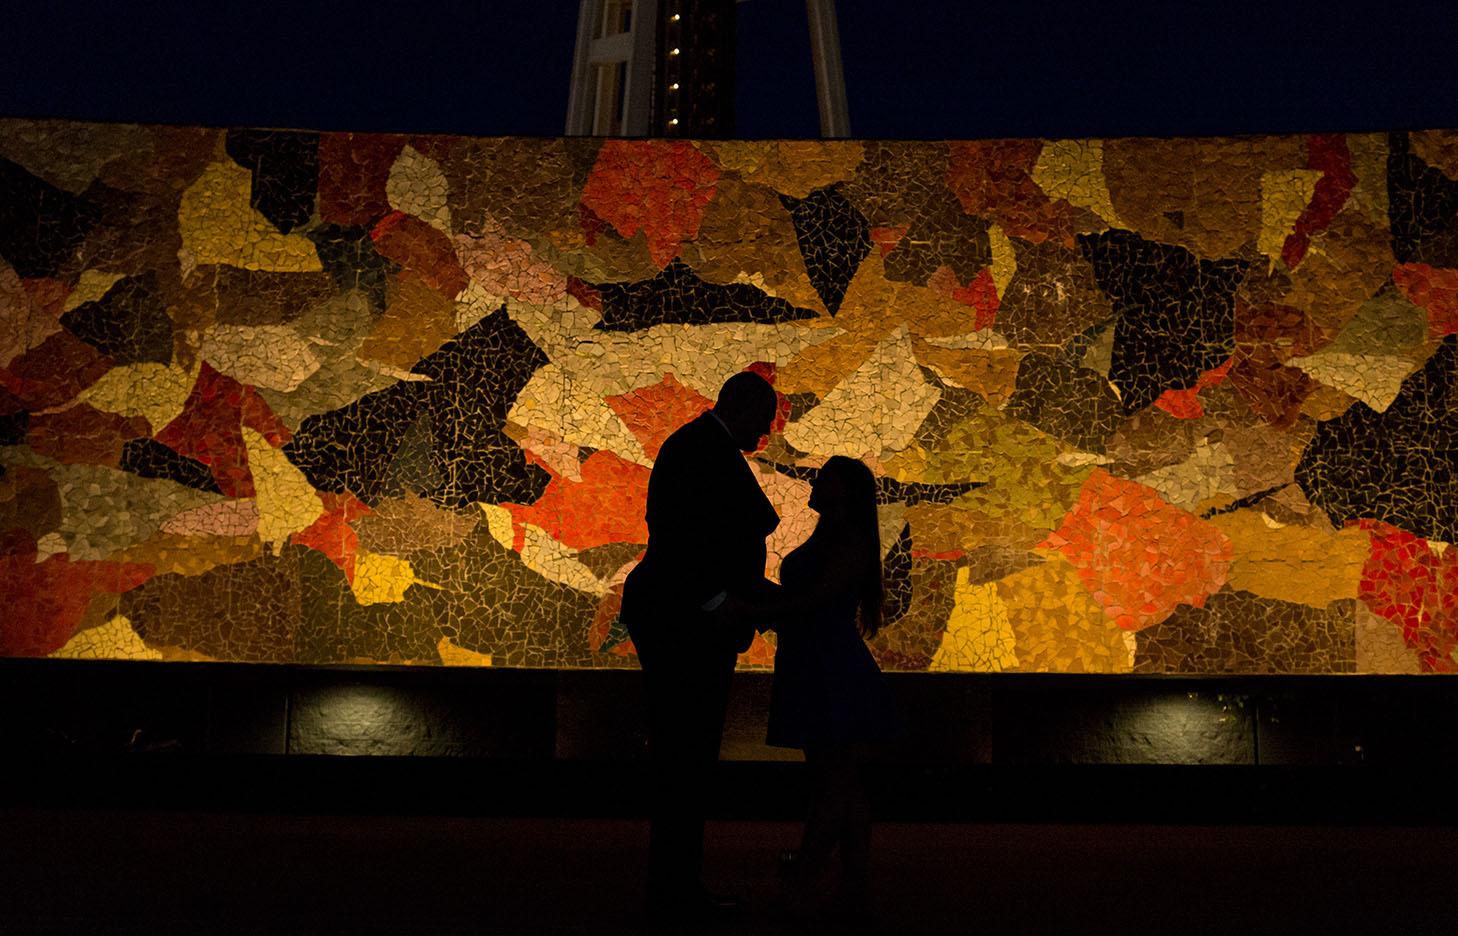 Seattle surprise proposal engagement photography